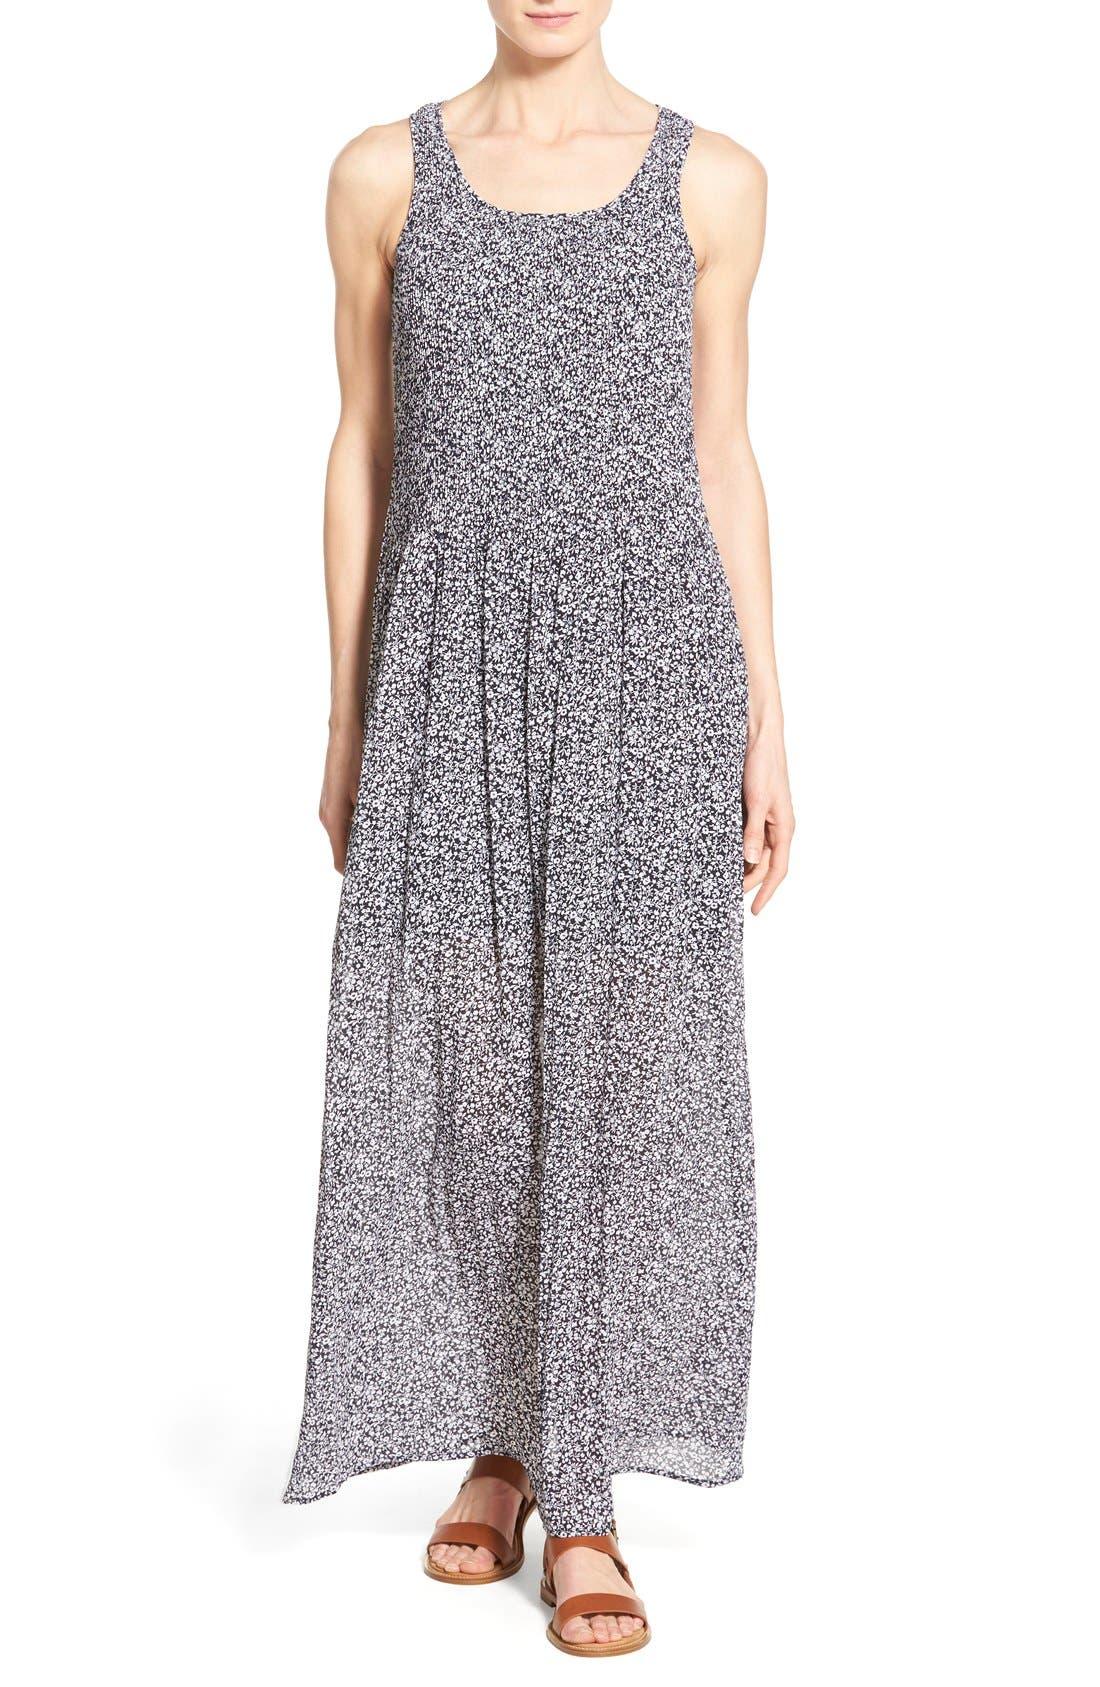 Alternate Image 1 Selected - MICHAEL Michael Kors 'Liona' Print Pintuck A-Line Maxi Dress